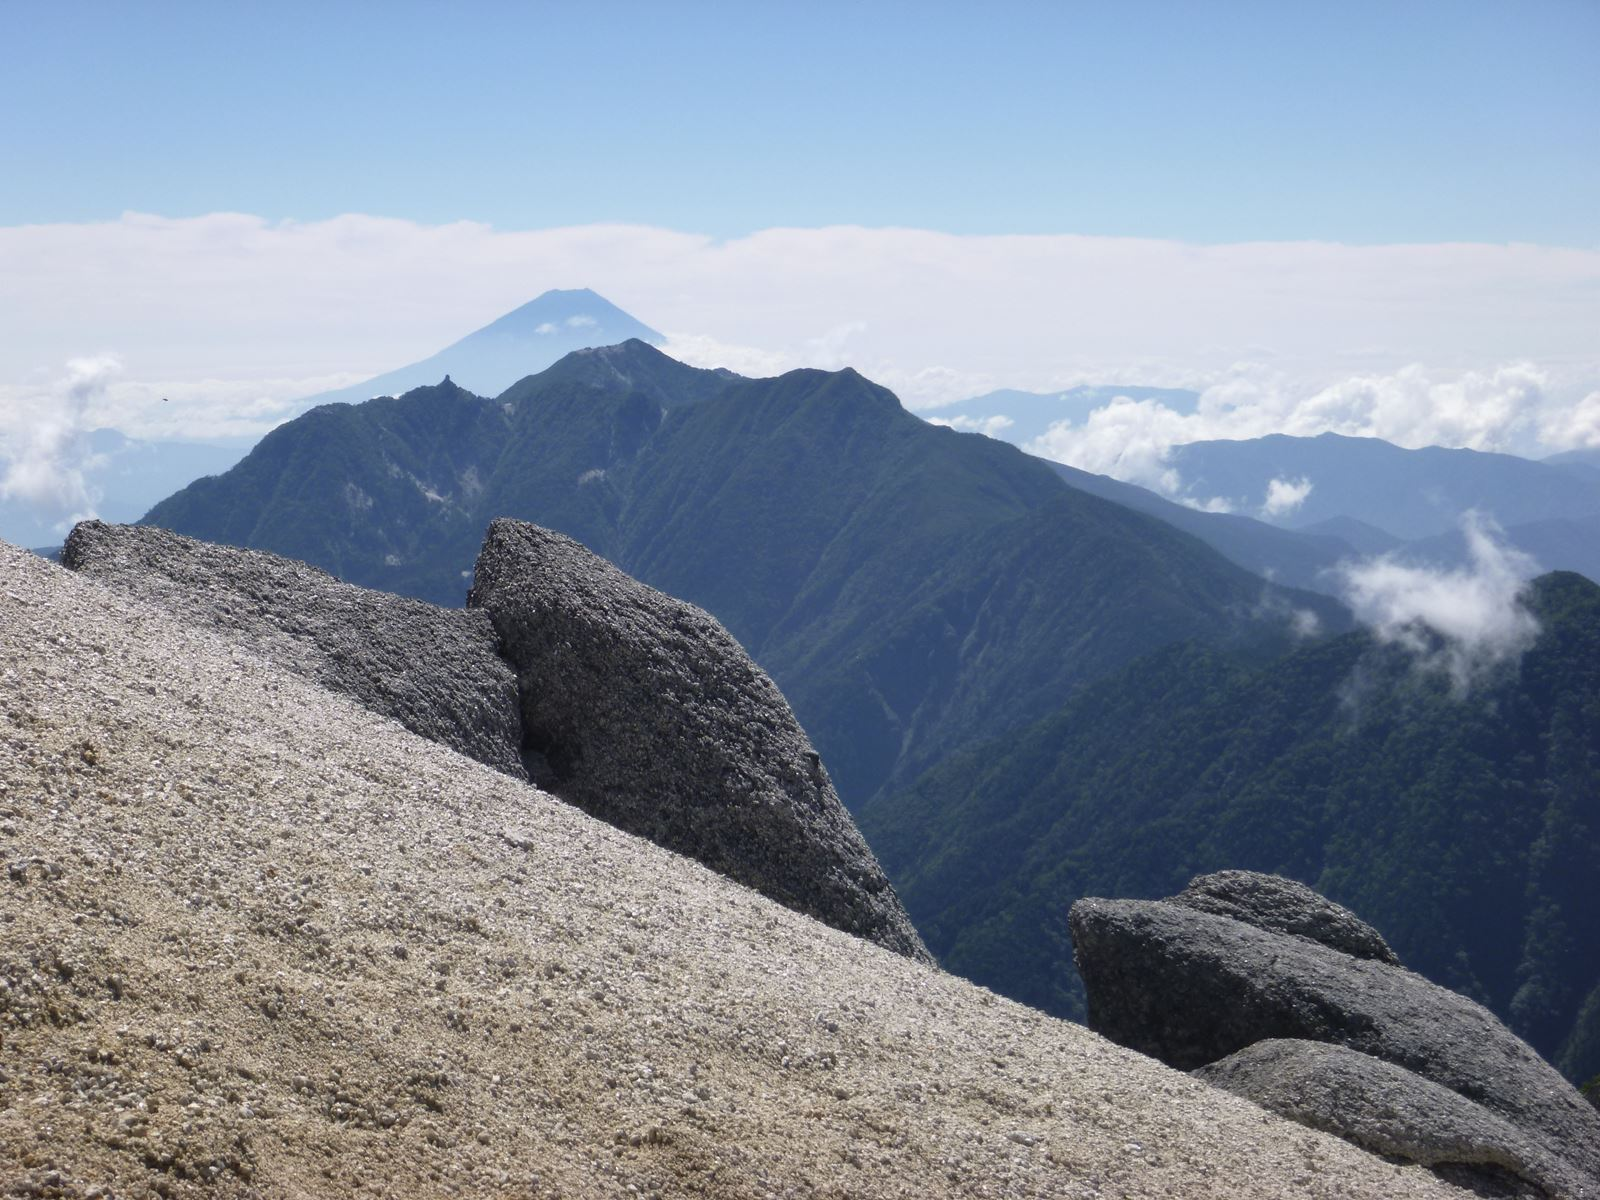 社長の登山日記 甲斐駒ケ岳 頂上直下の急登